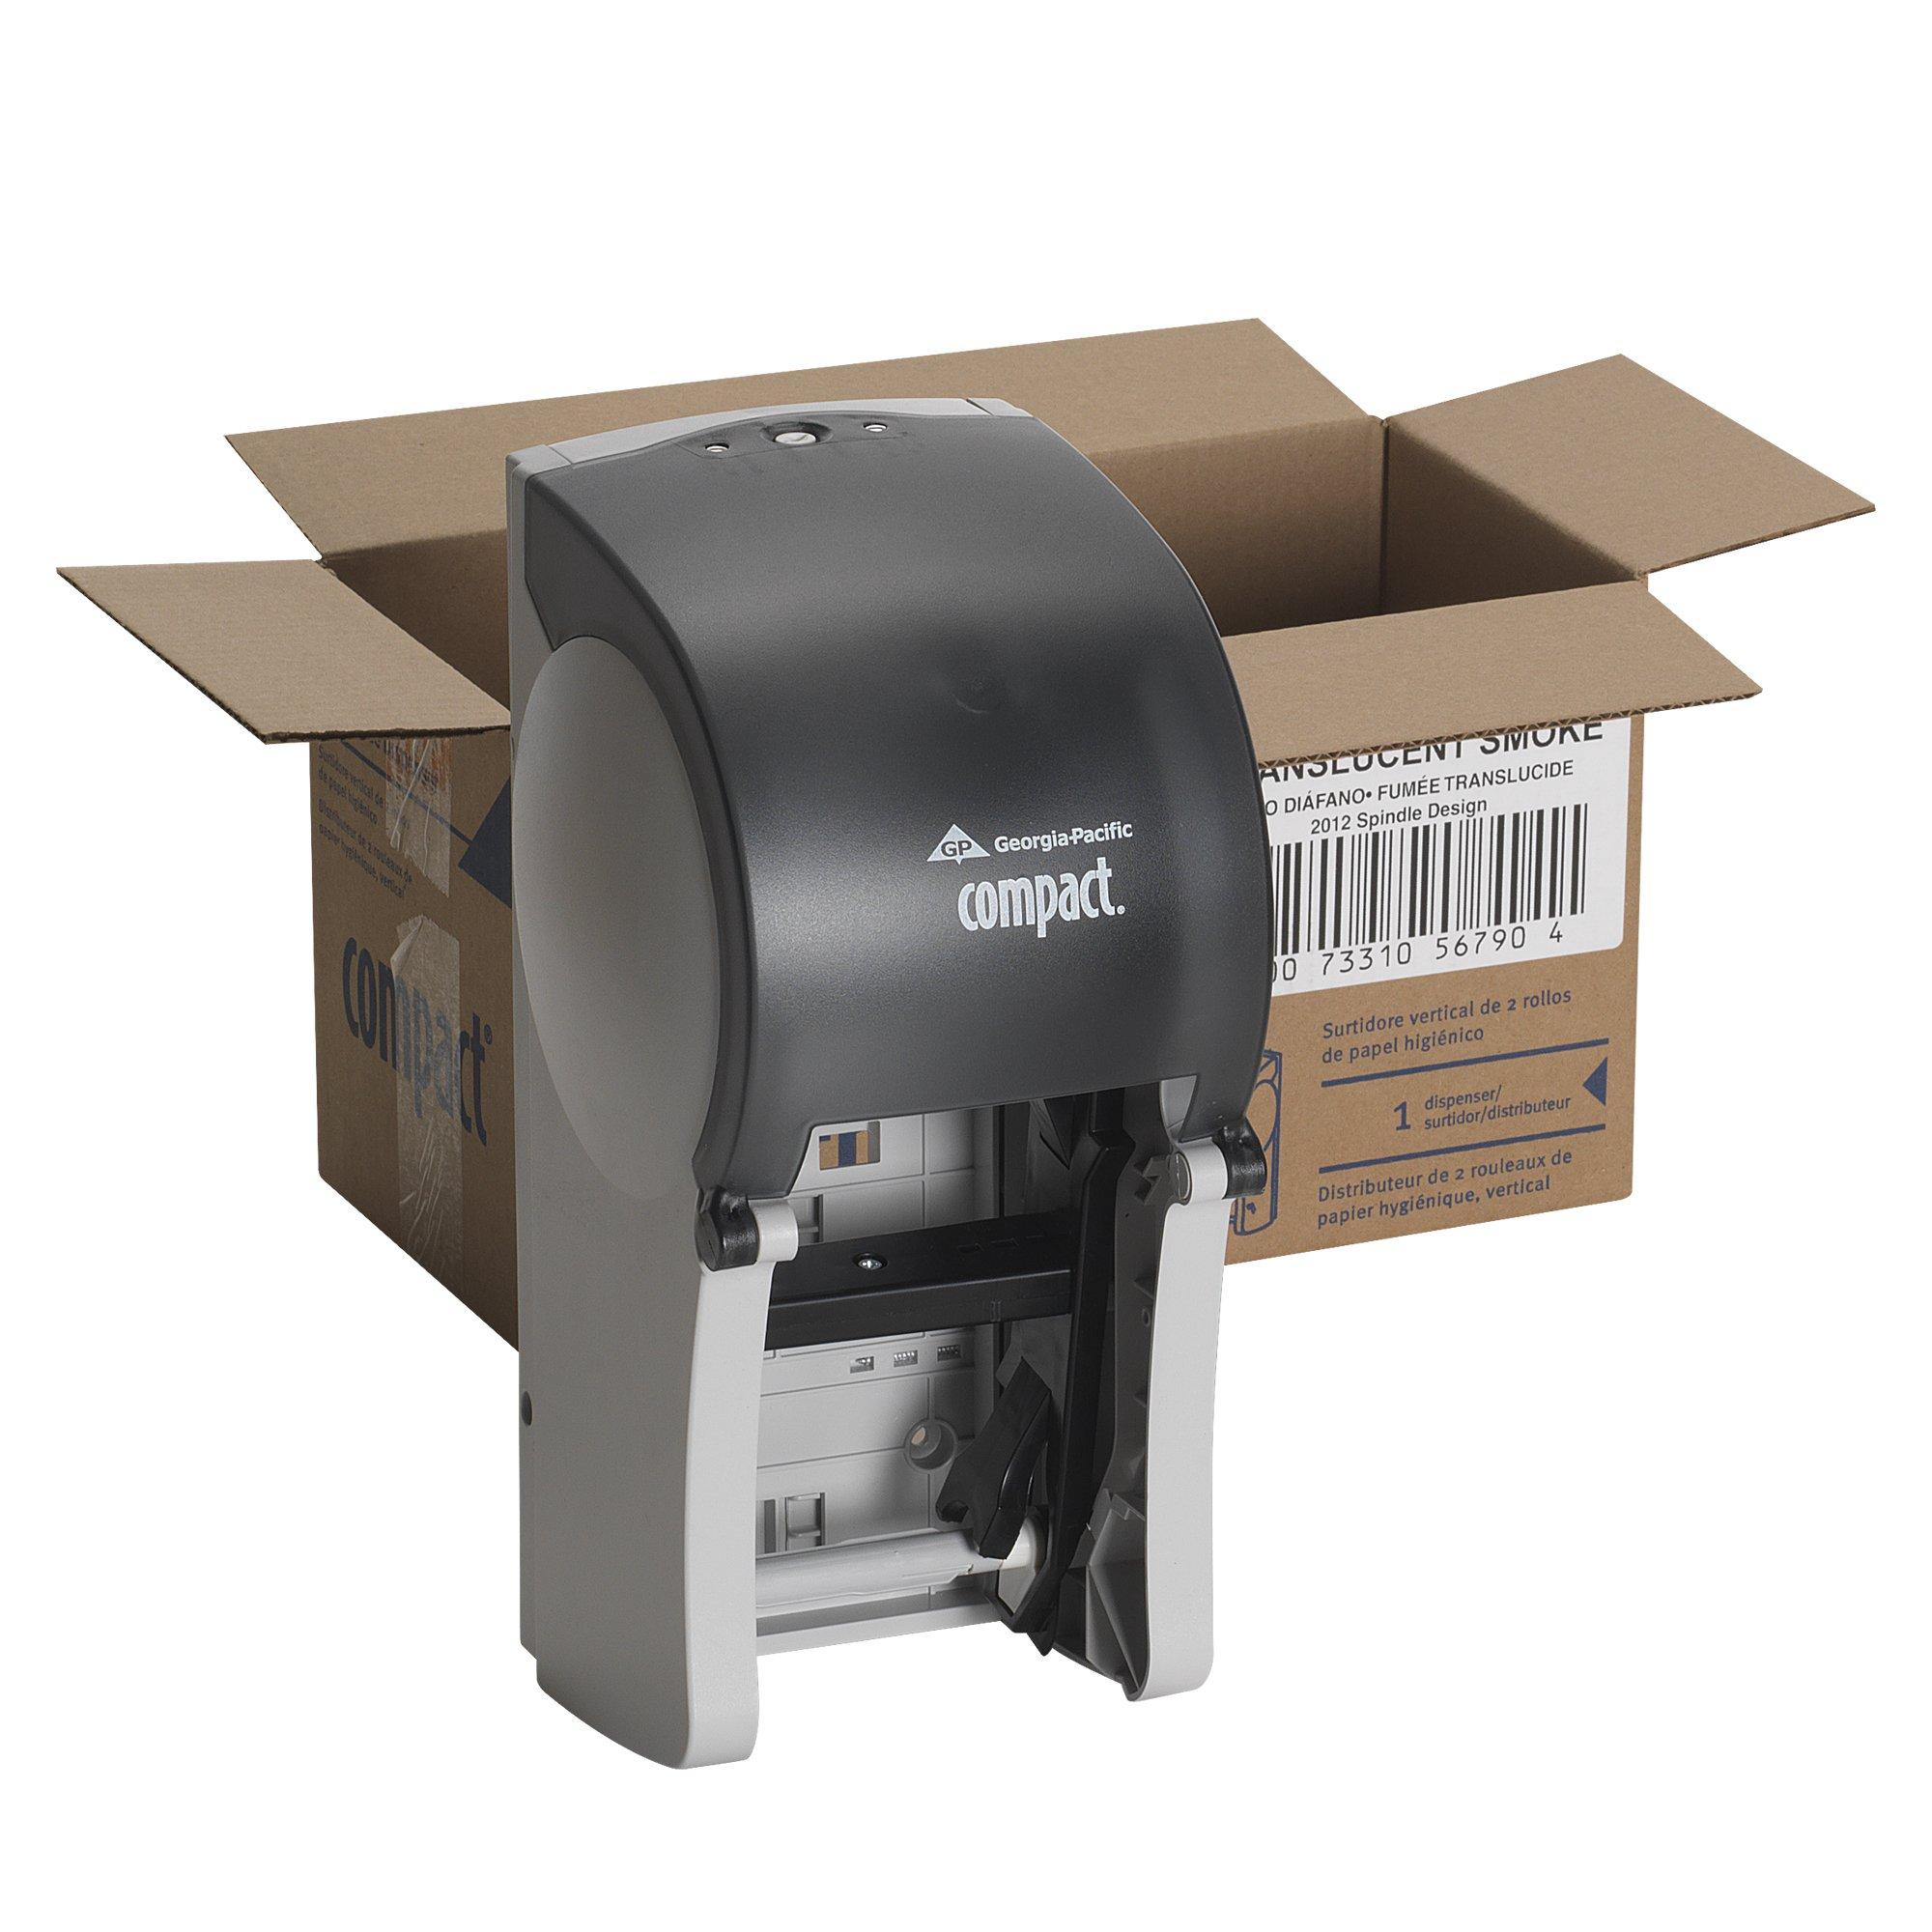 Compact GPC 567-90 6'' Width, 13.50'' Height, 6.50'' Depth Vertical Double Roll Coreless Tissue Dispenser